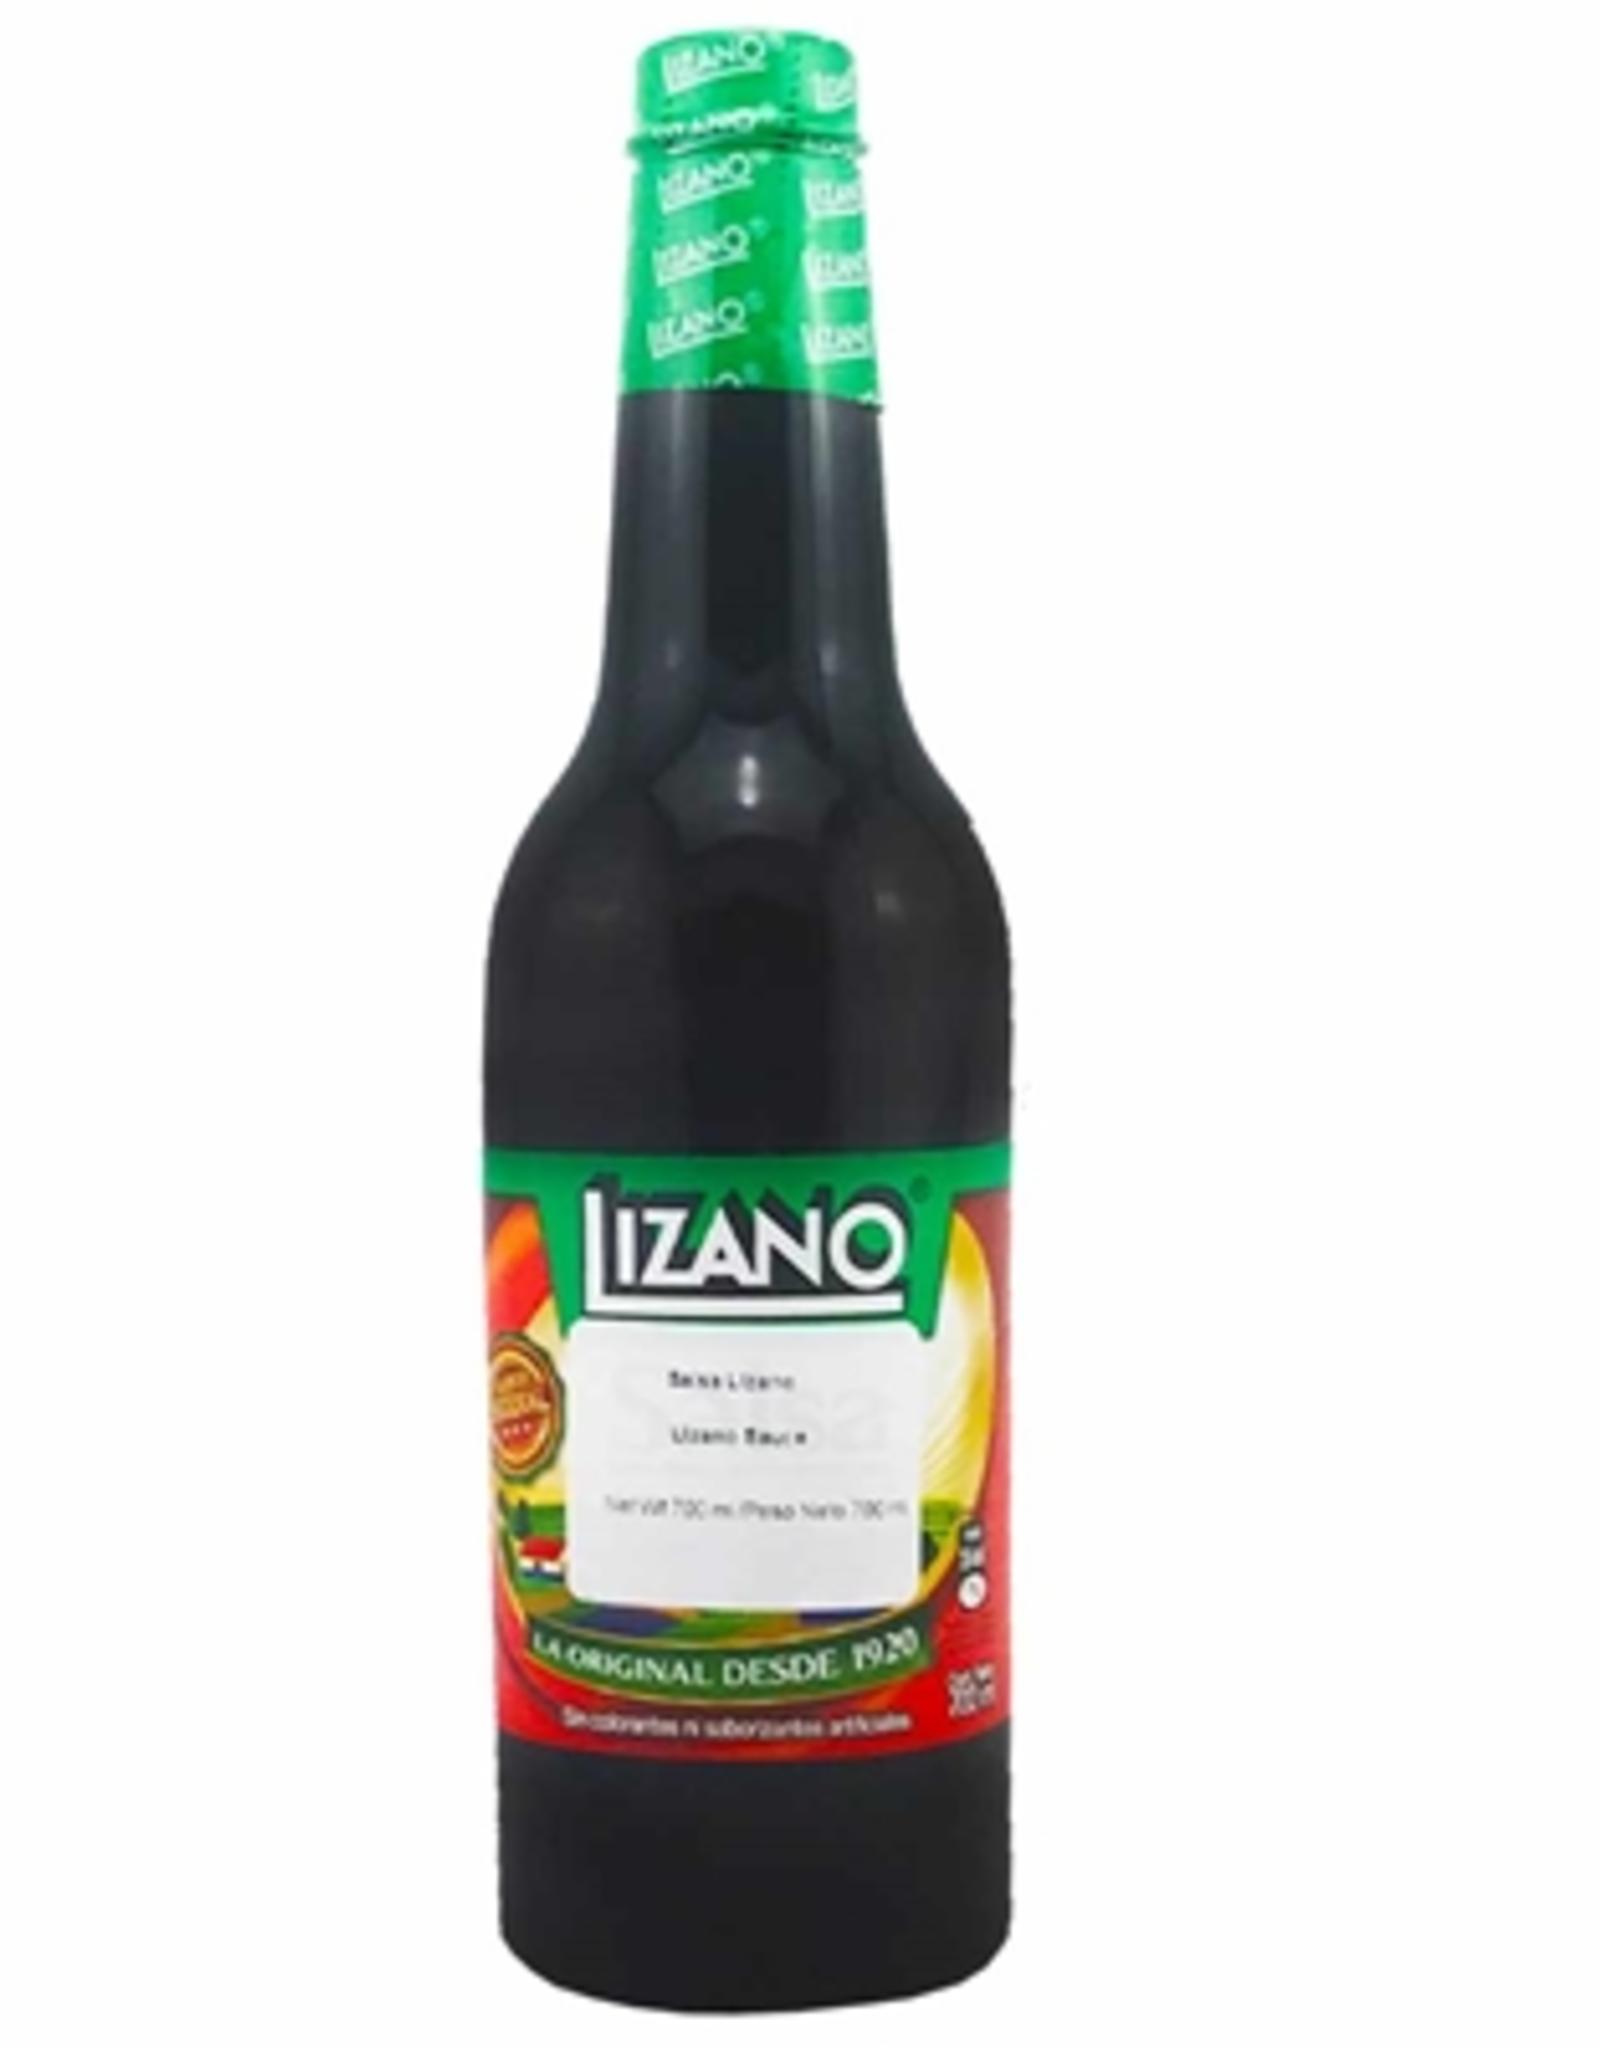 Hot Shots Distributing Salsa Lizano, Costa Rica